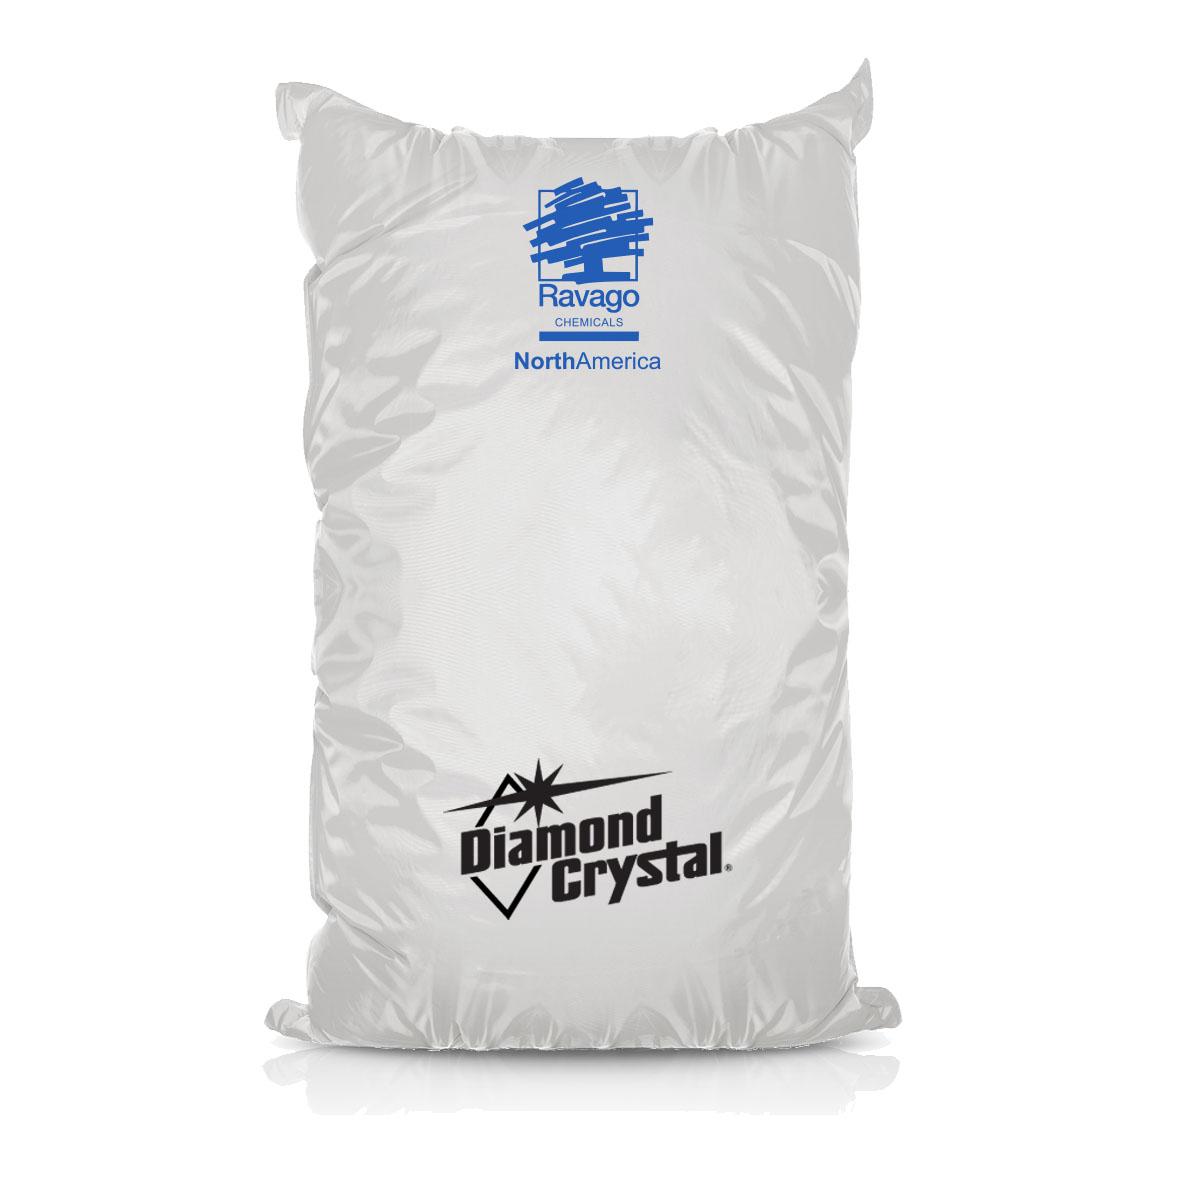 Diamond Crystal Potassium Chloride